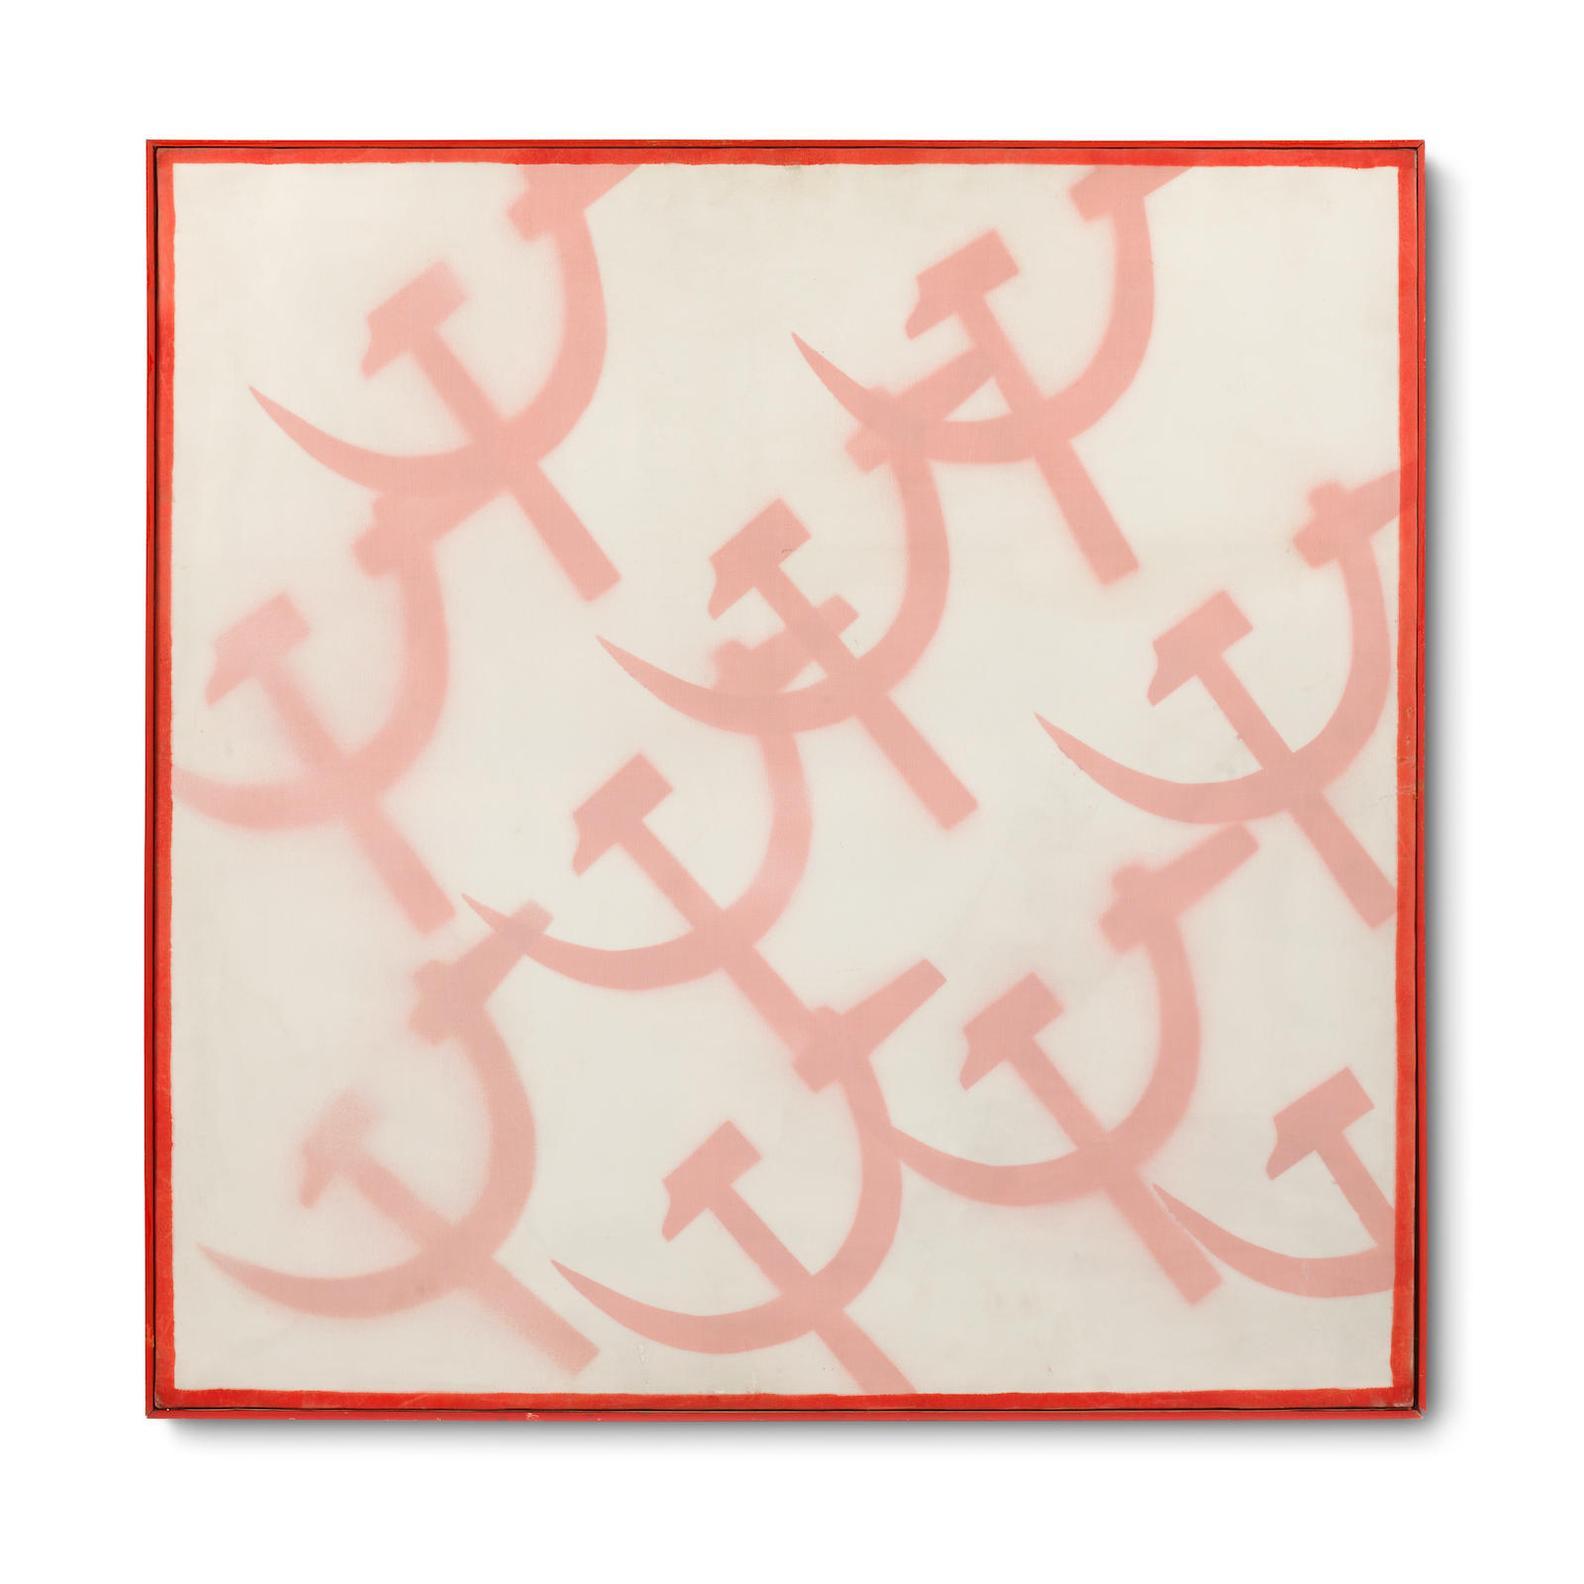 Franco Angeli-Untitled-1969